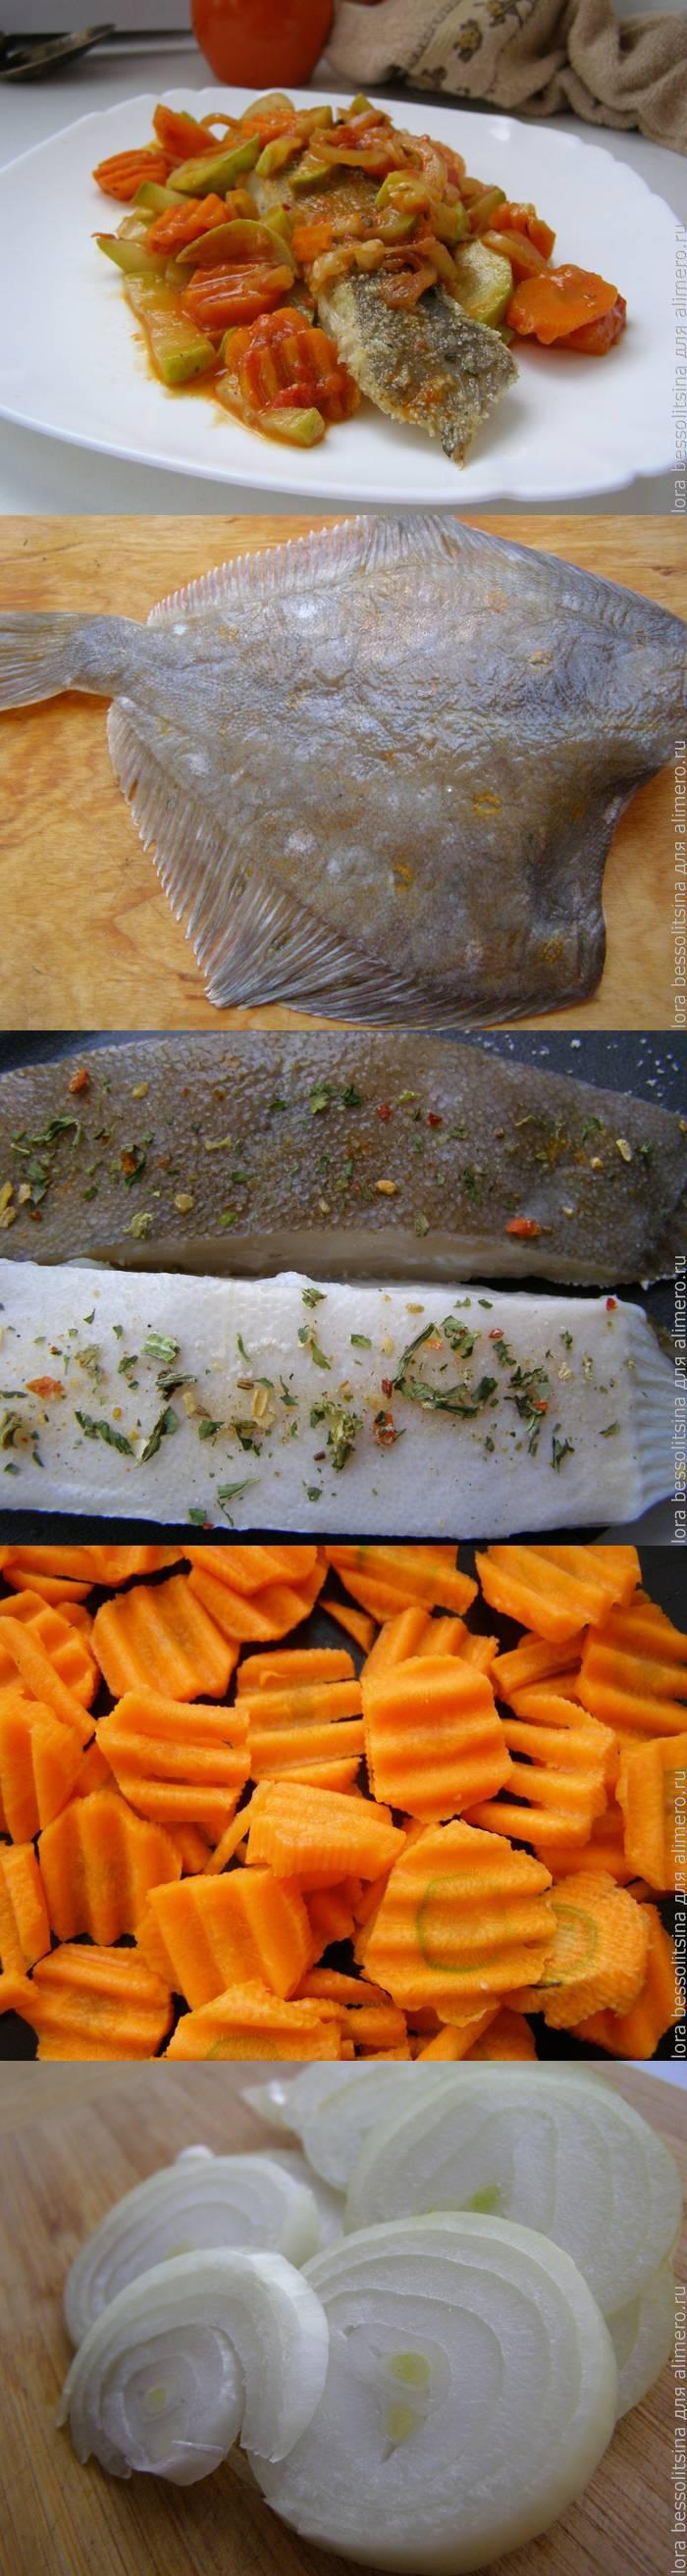 Камбала жареная на сковороде с овощами